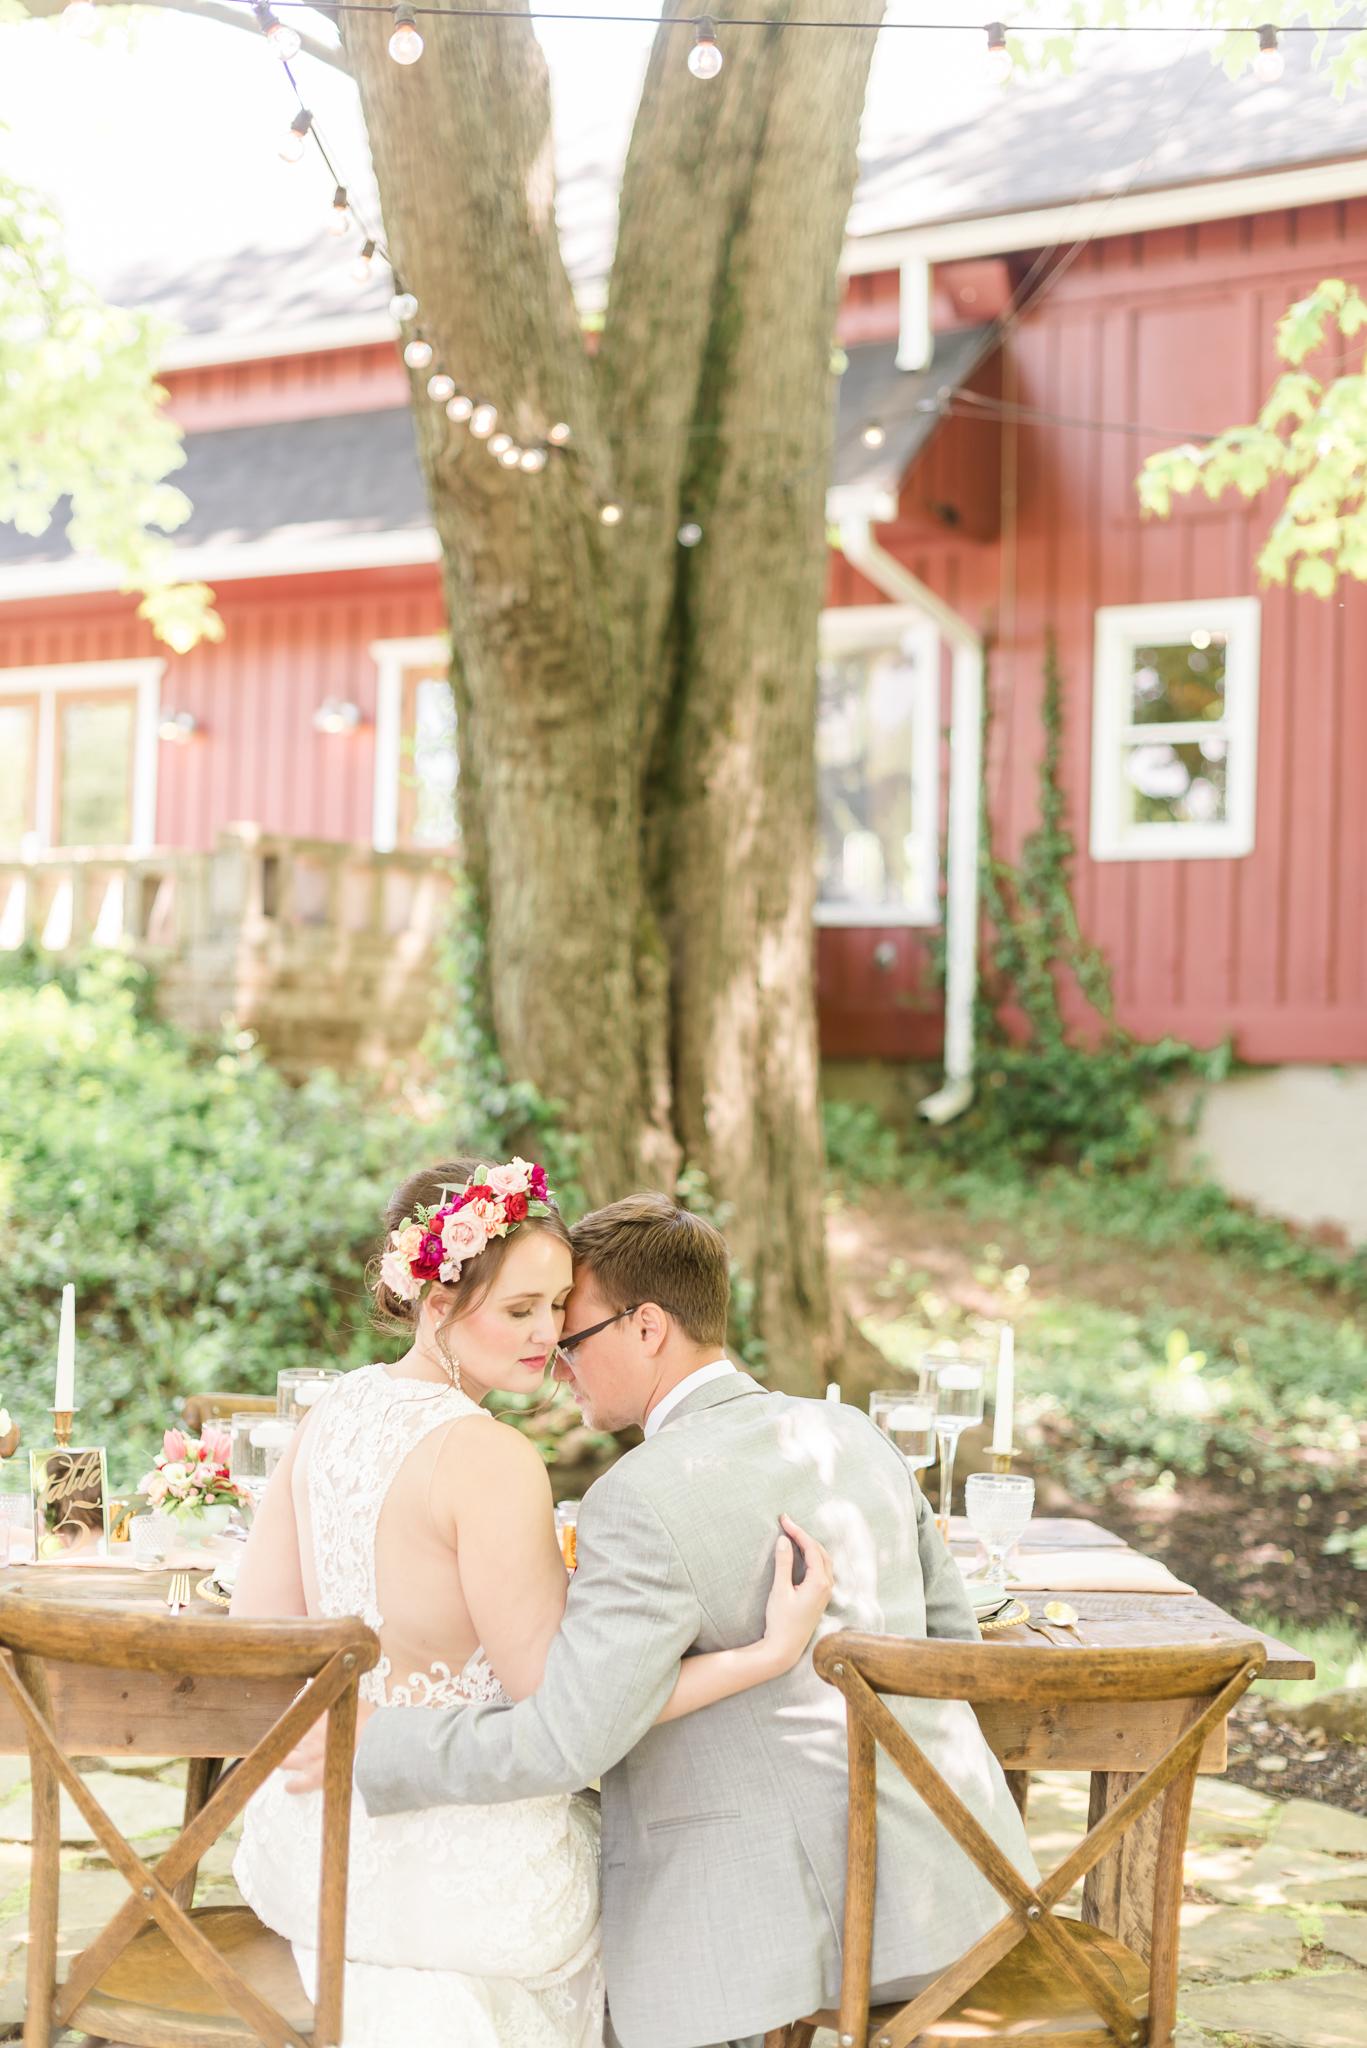 Mustard Seed Gardens Wedding Indianapolis Noblesvile Fishers Wedding Photographer-69.jpg